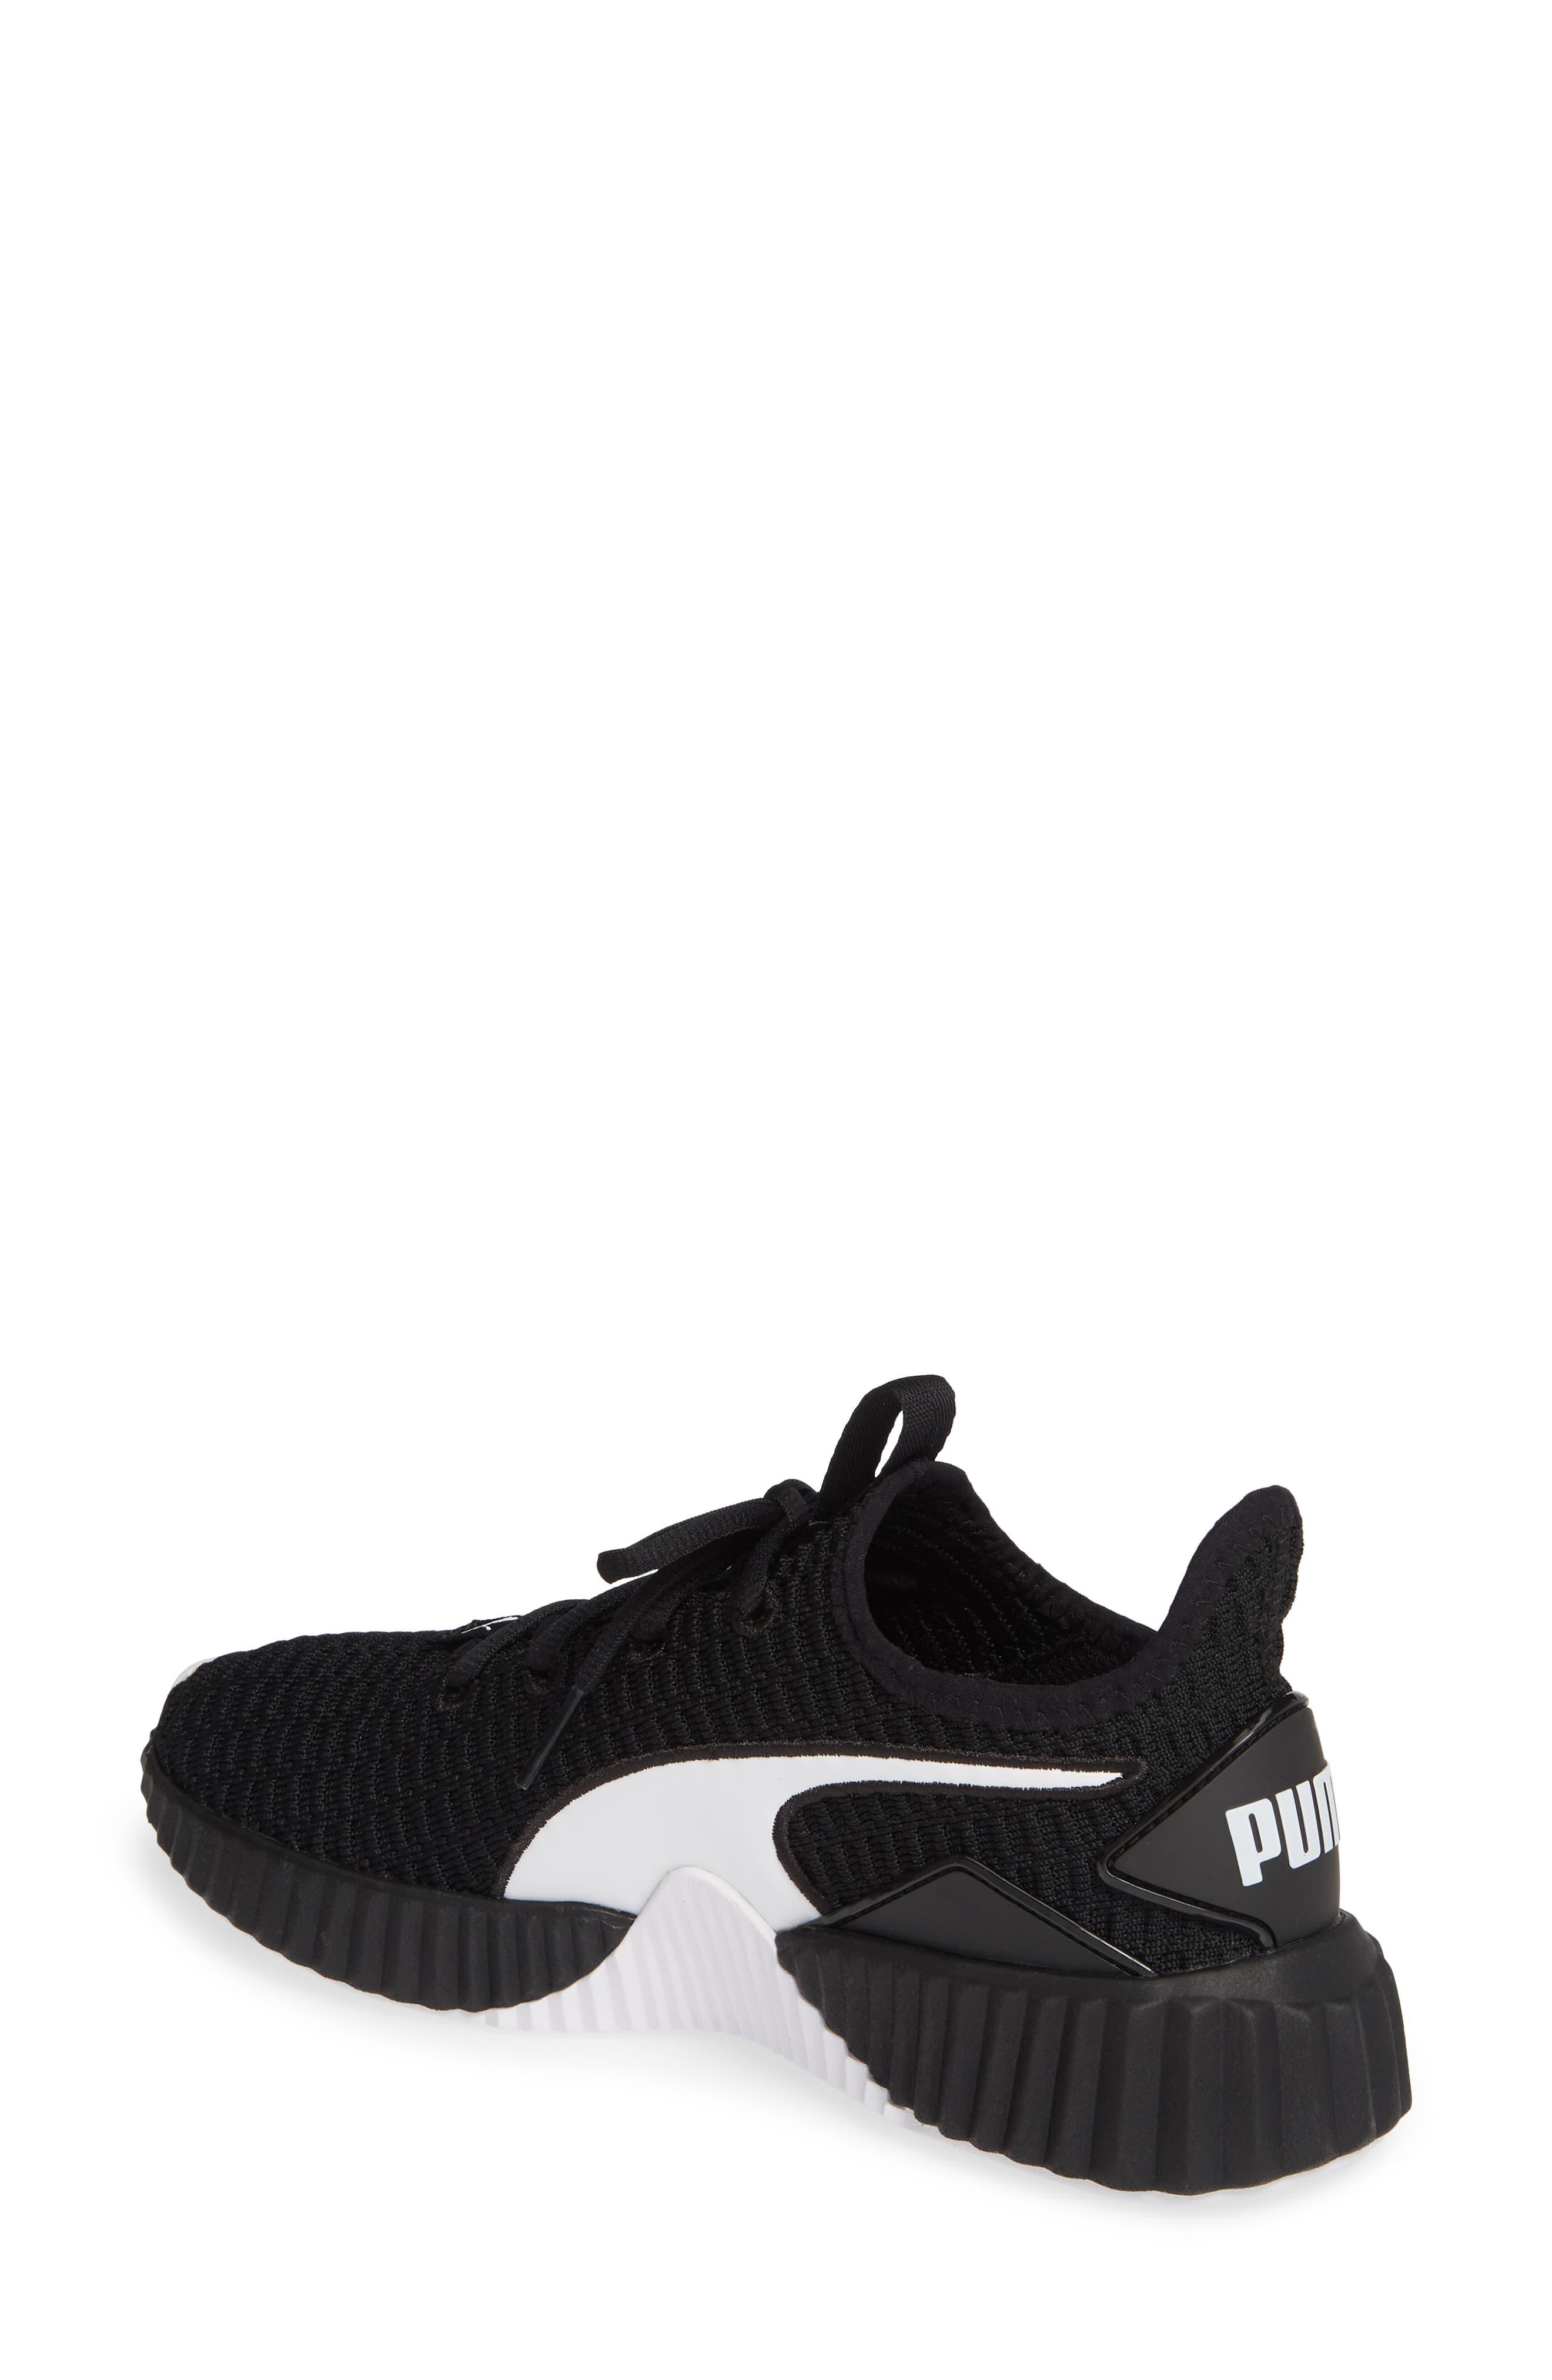 PUMA, Defy Sneaker, Alternate thumbnail 2, color, BLACK/ WHITE